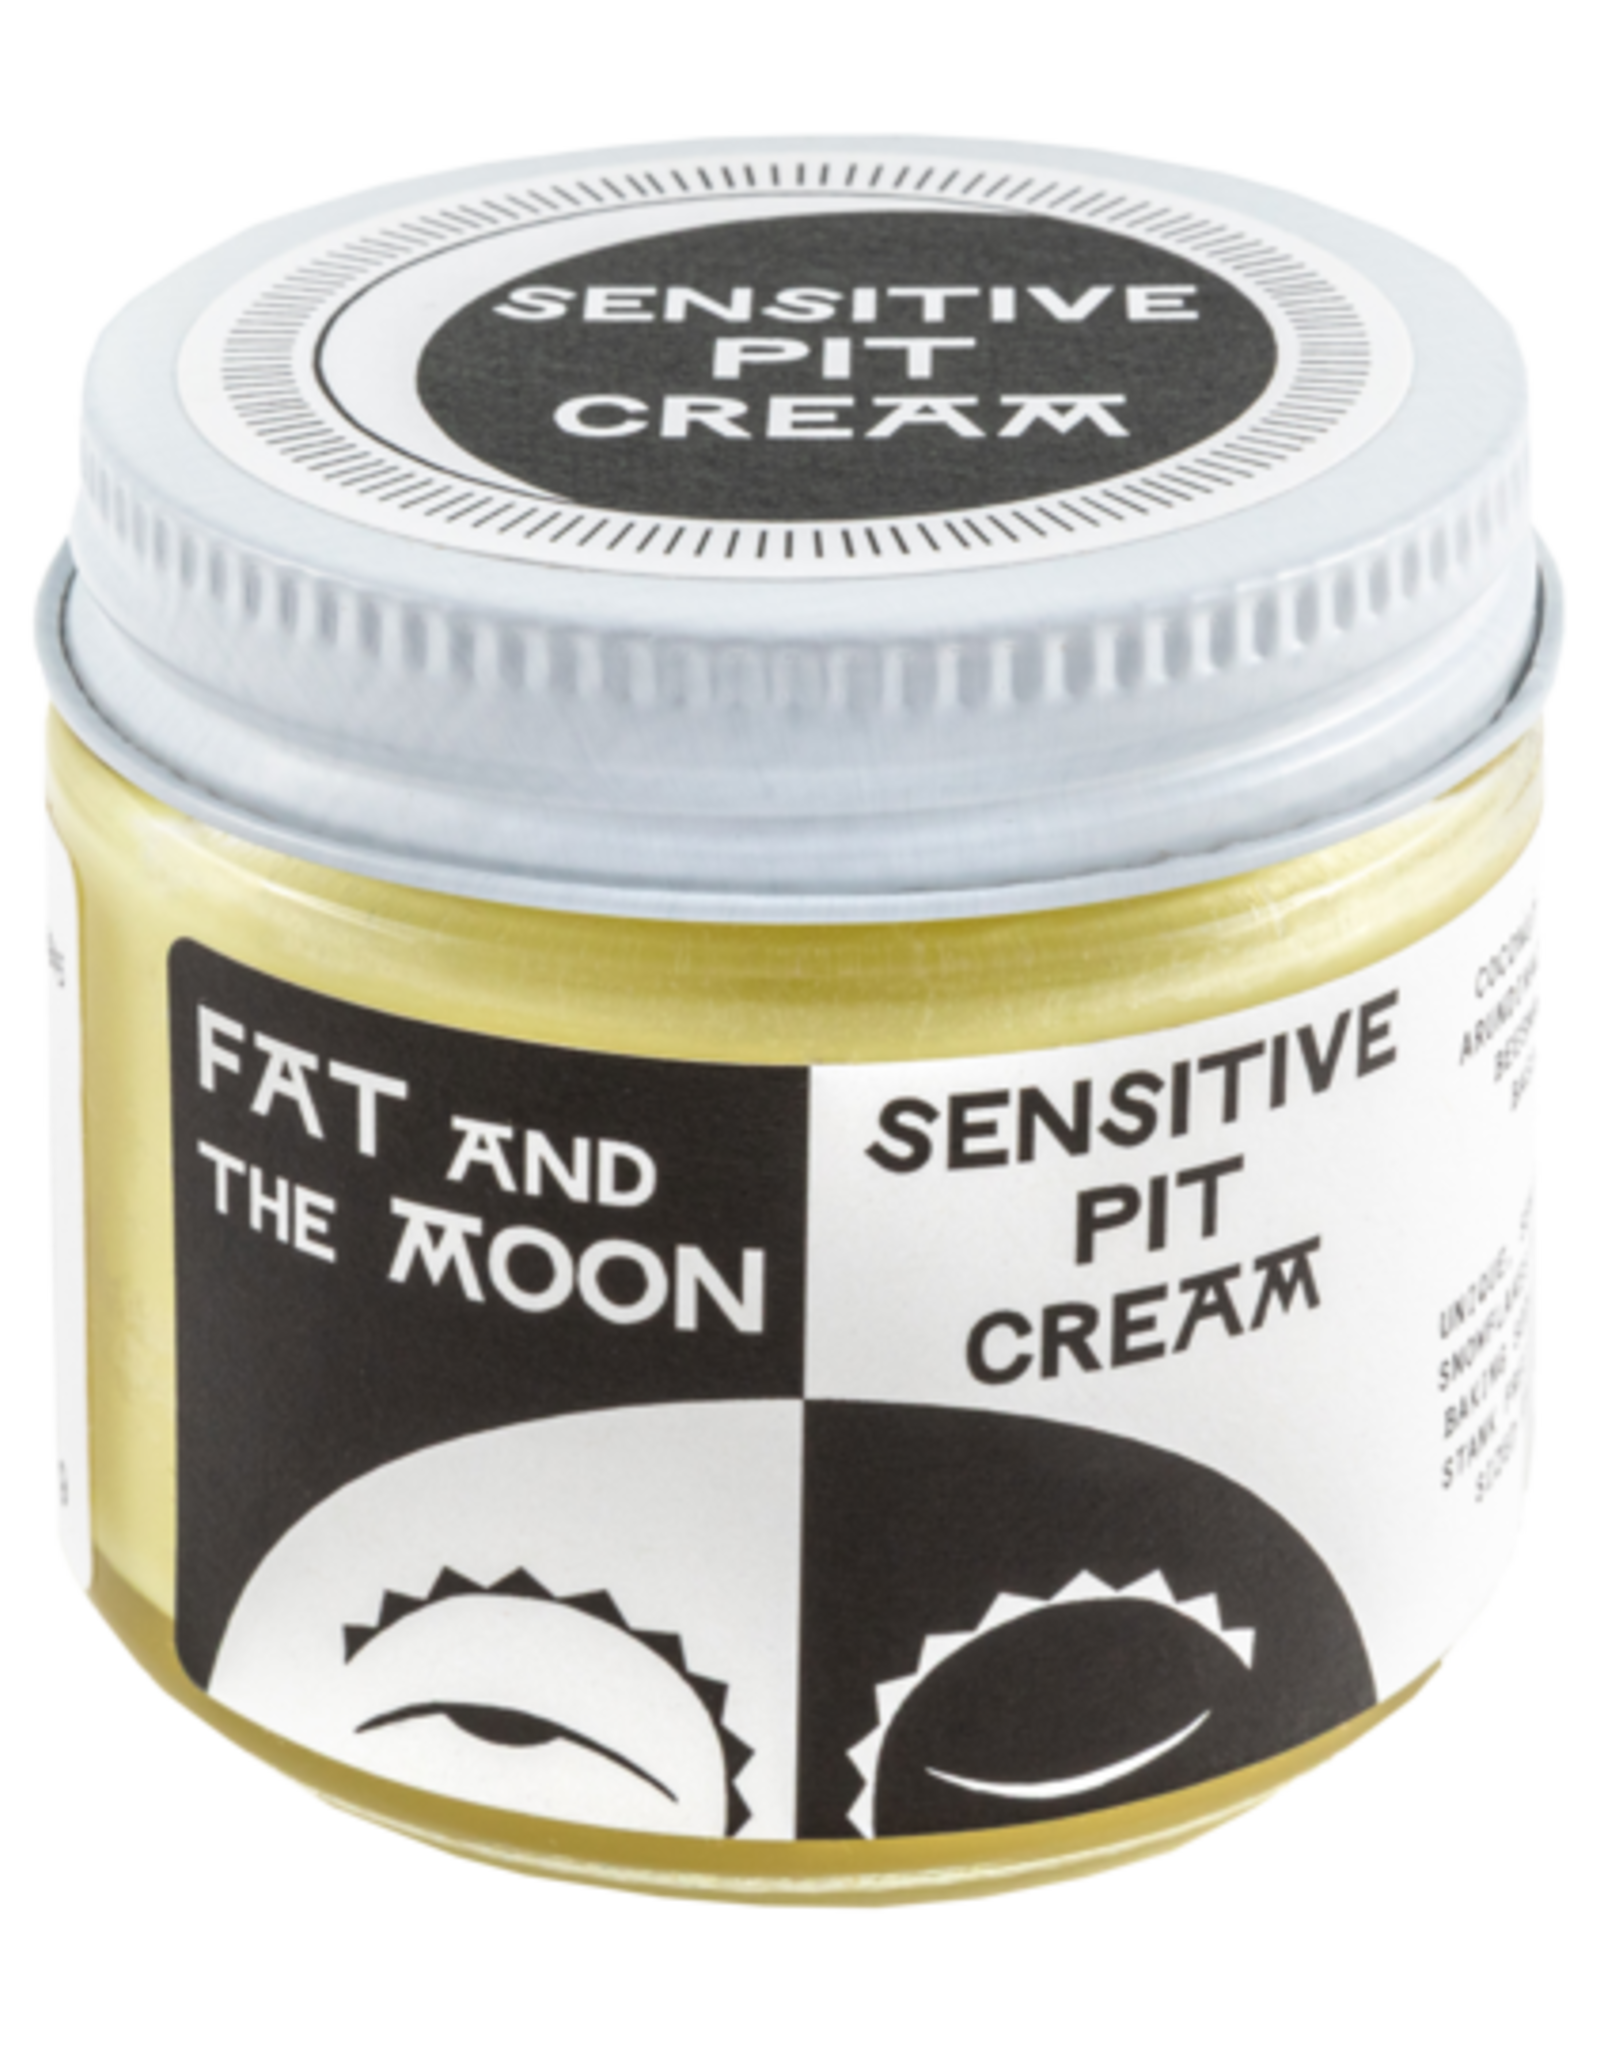 Sensitive Pit Cream